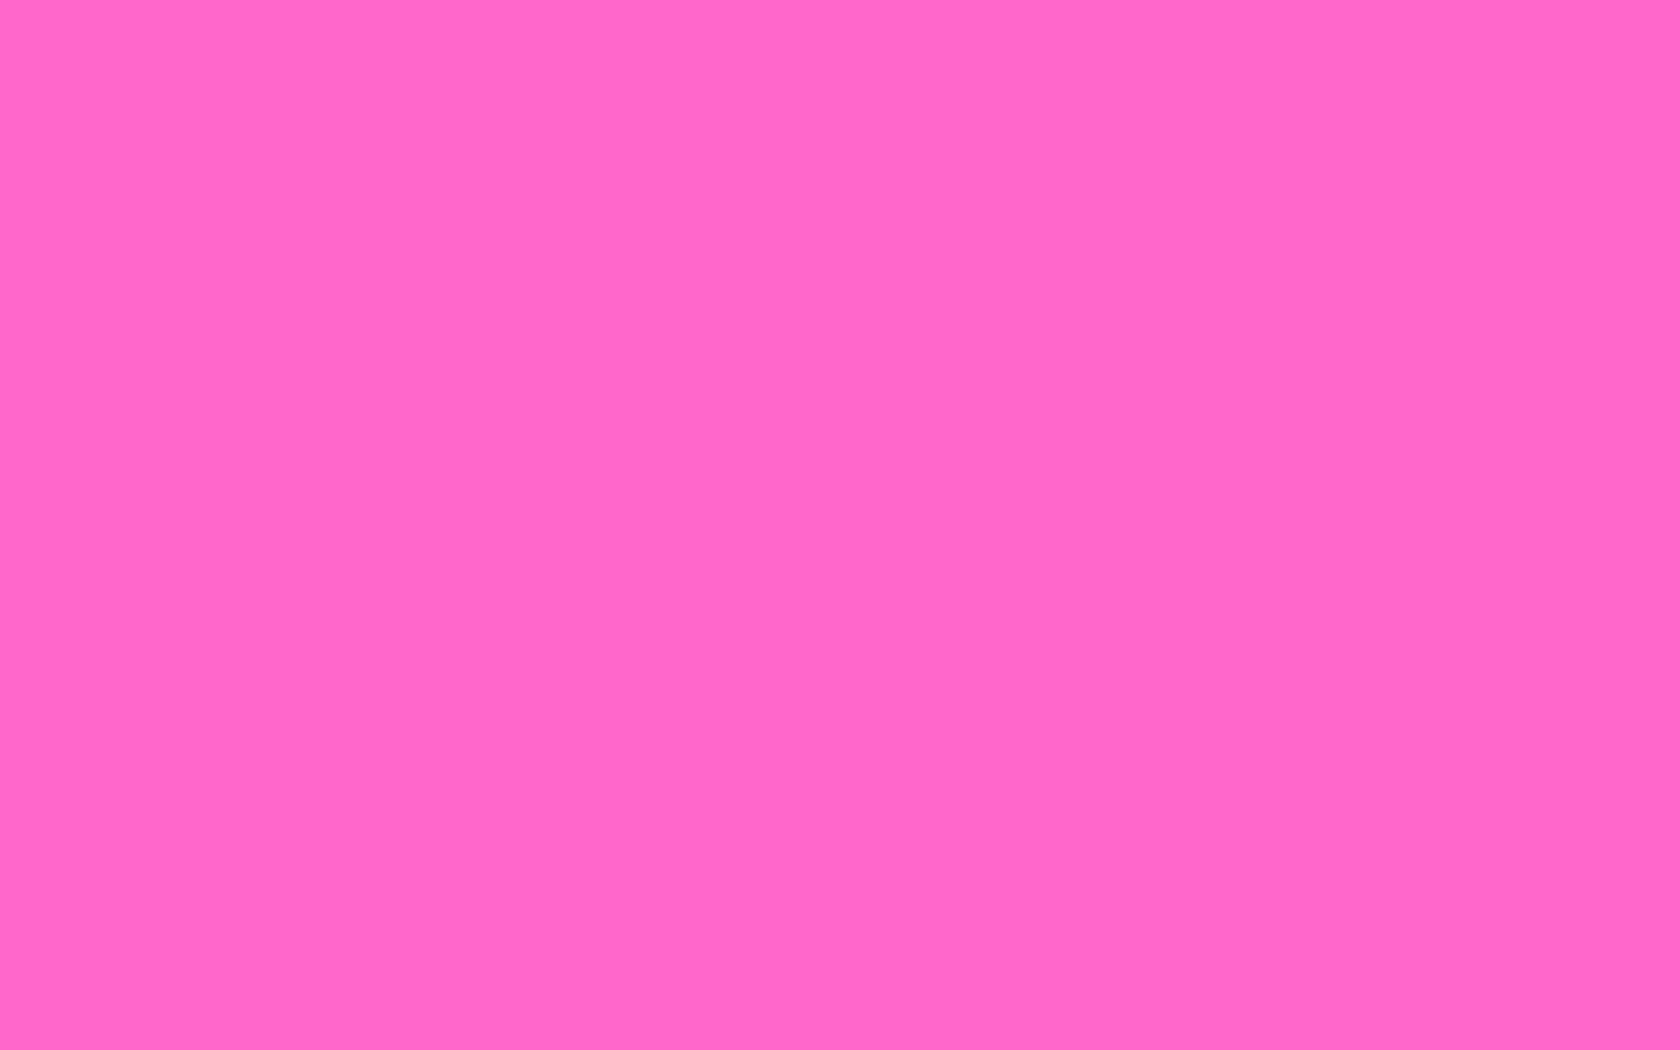 1680x1050 Rose Pink Solid Color Background